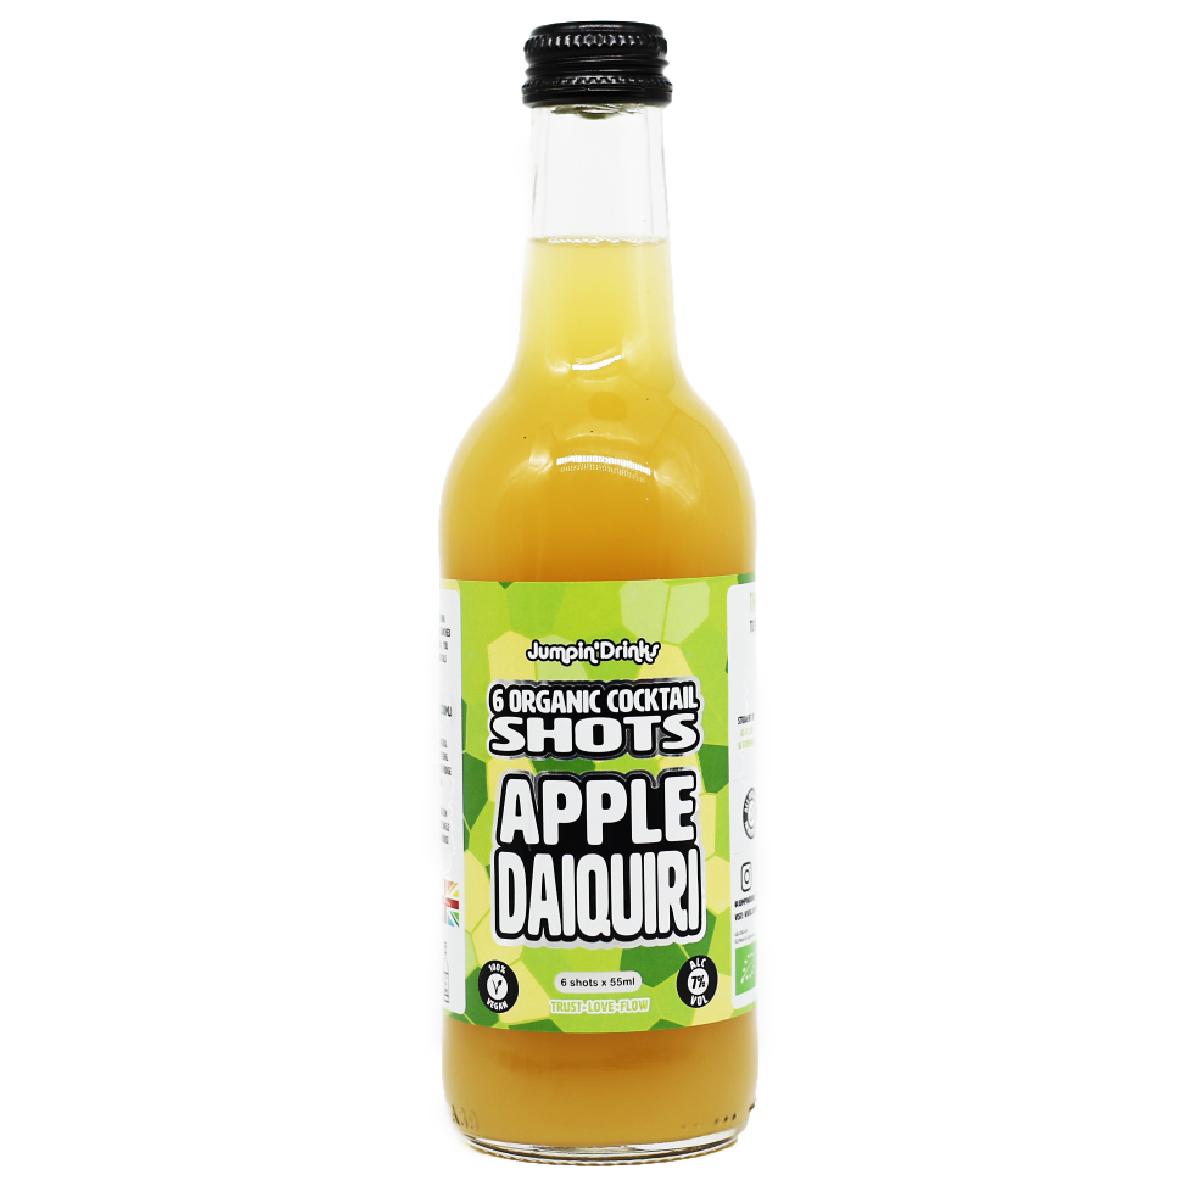 Apple Daiquiri